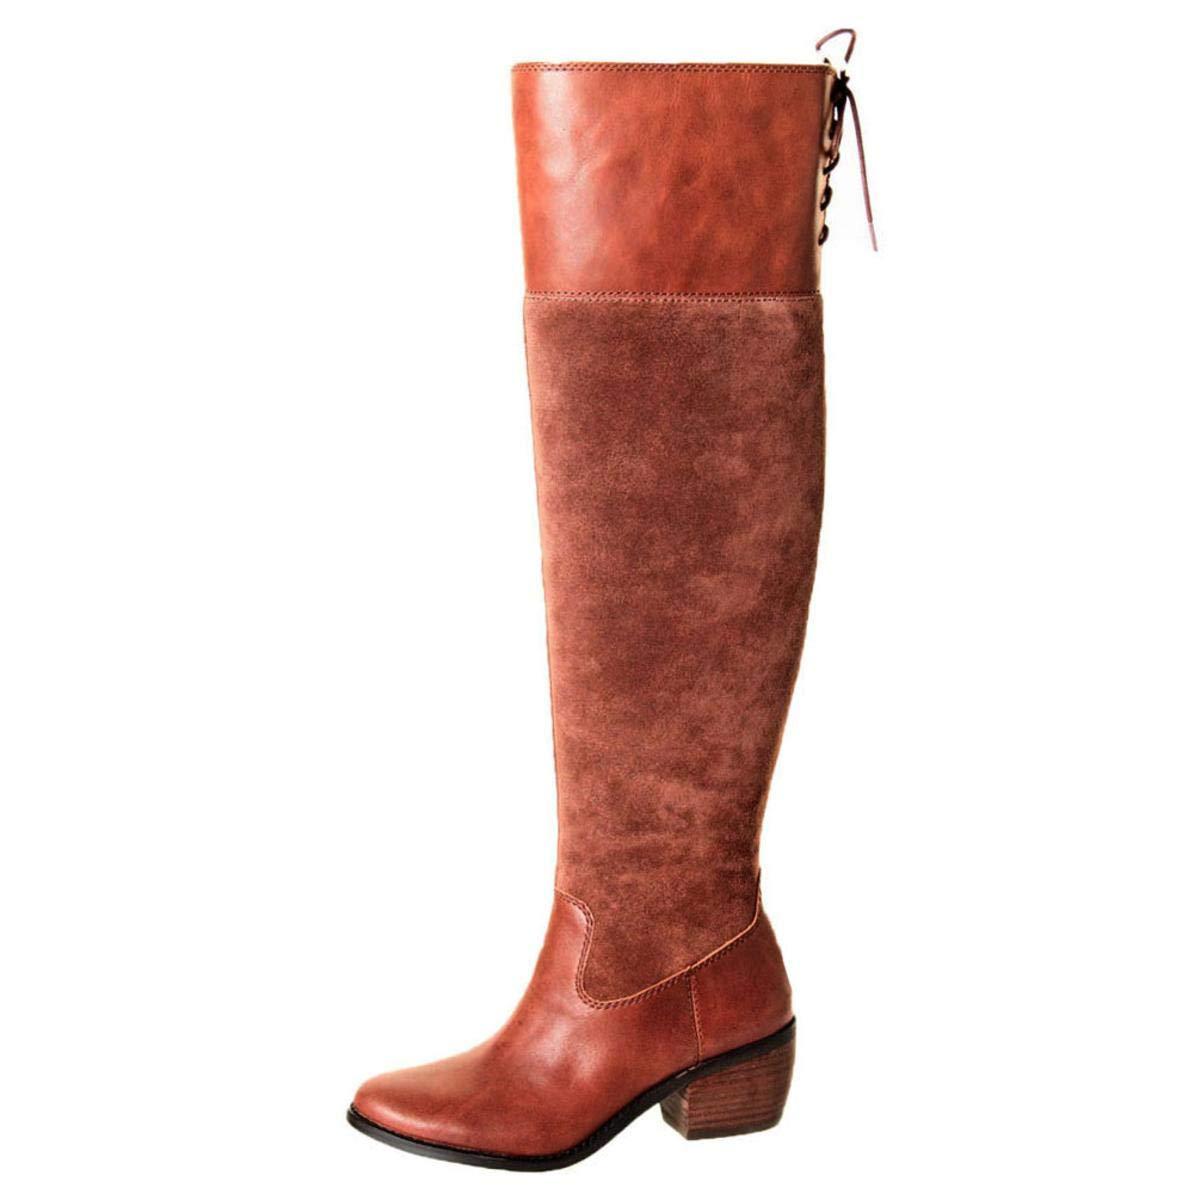 Lucky Brand Women's Komah Fashion Boot, Tobacco, 8 Medium US